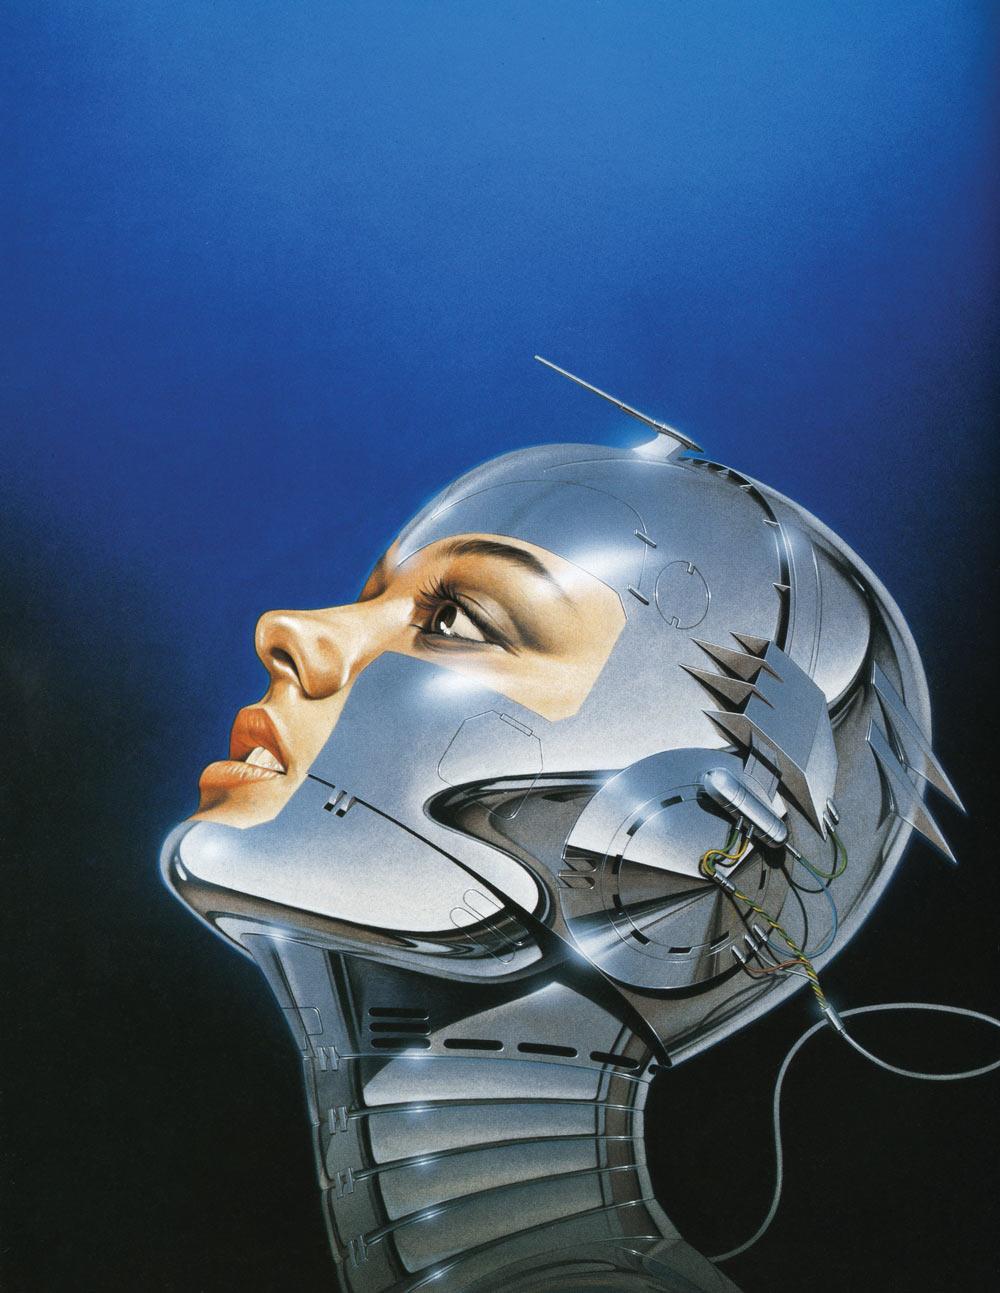 hajime-sorayama-sexy-robot-24